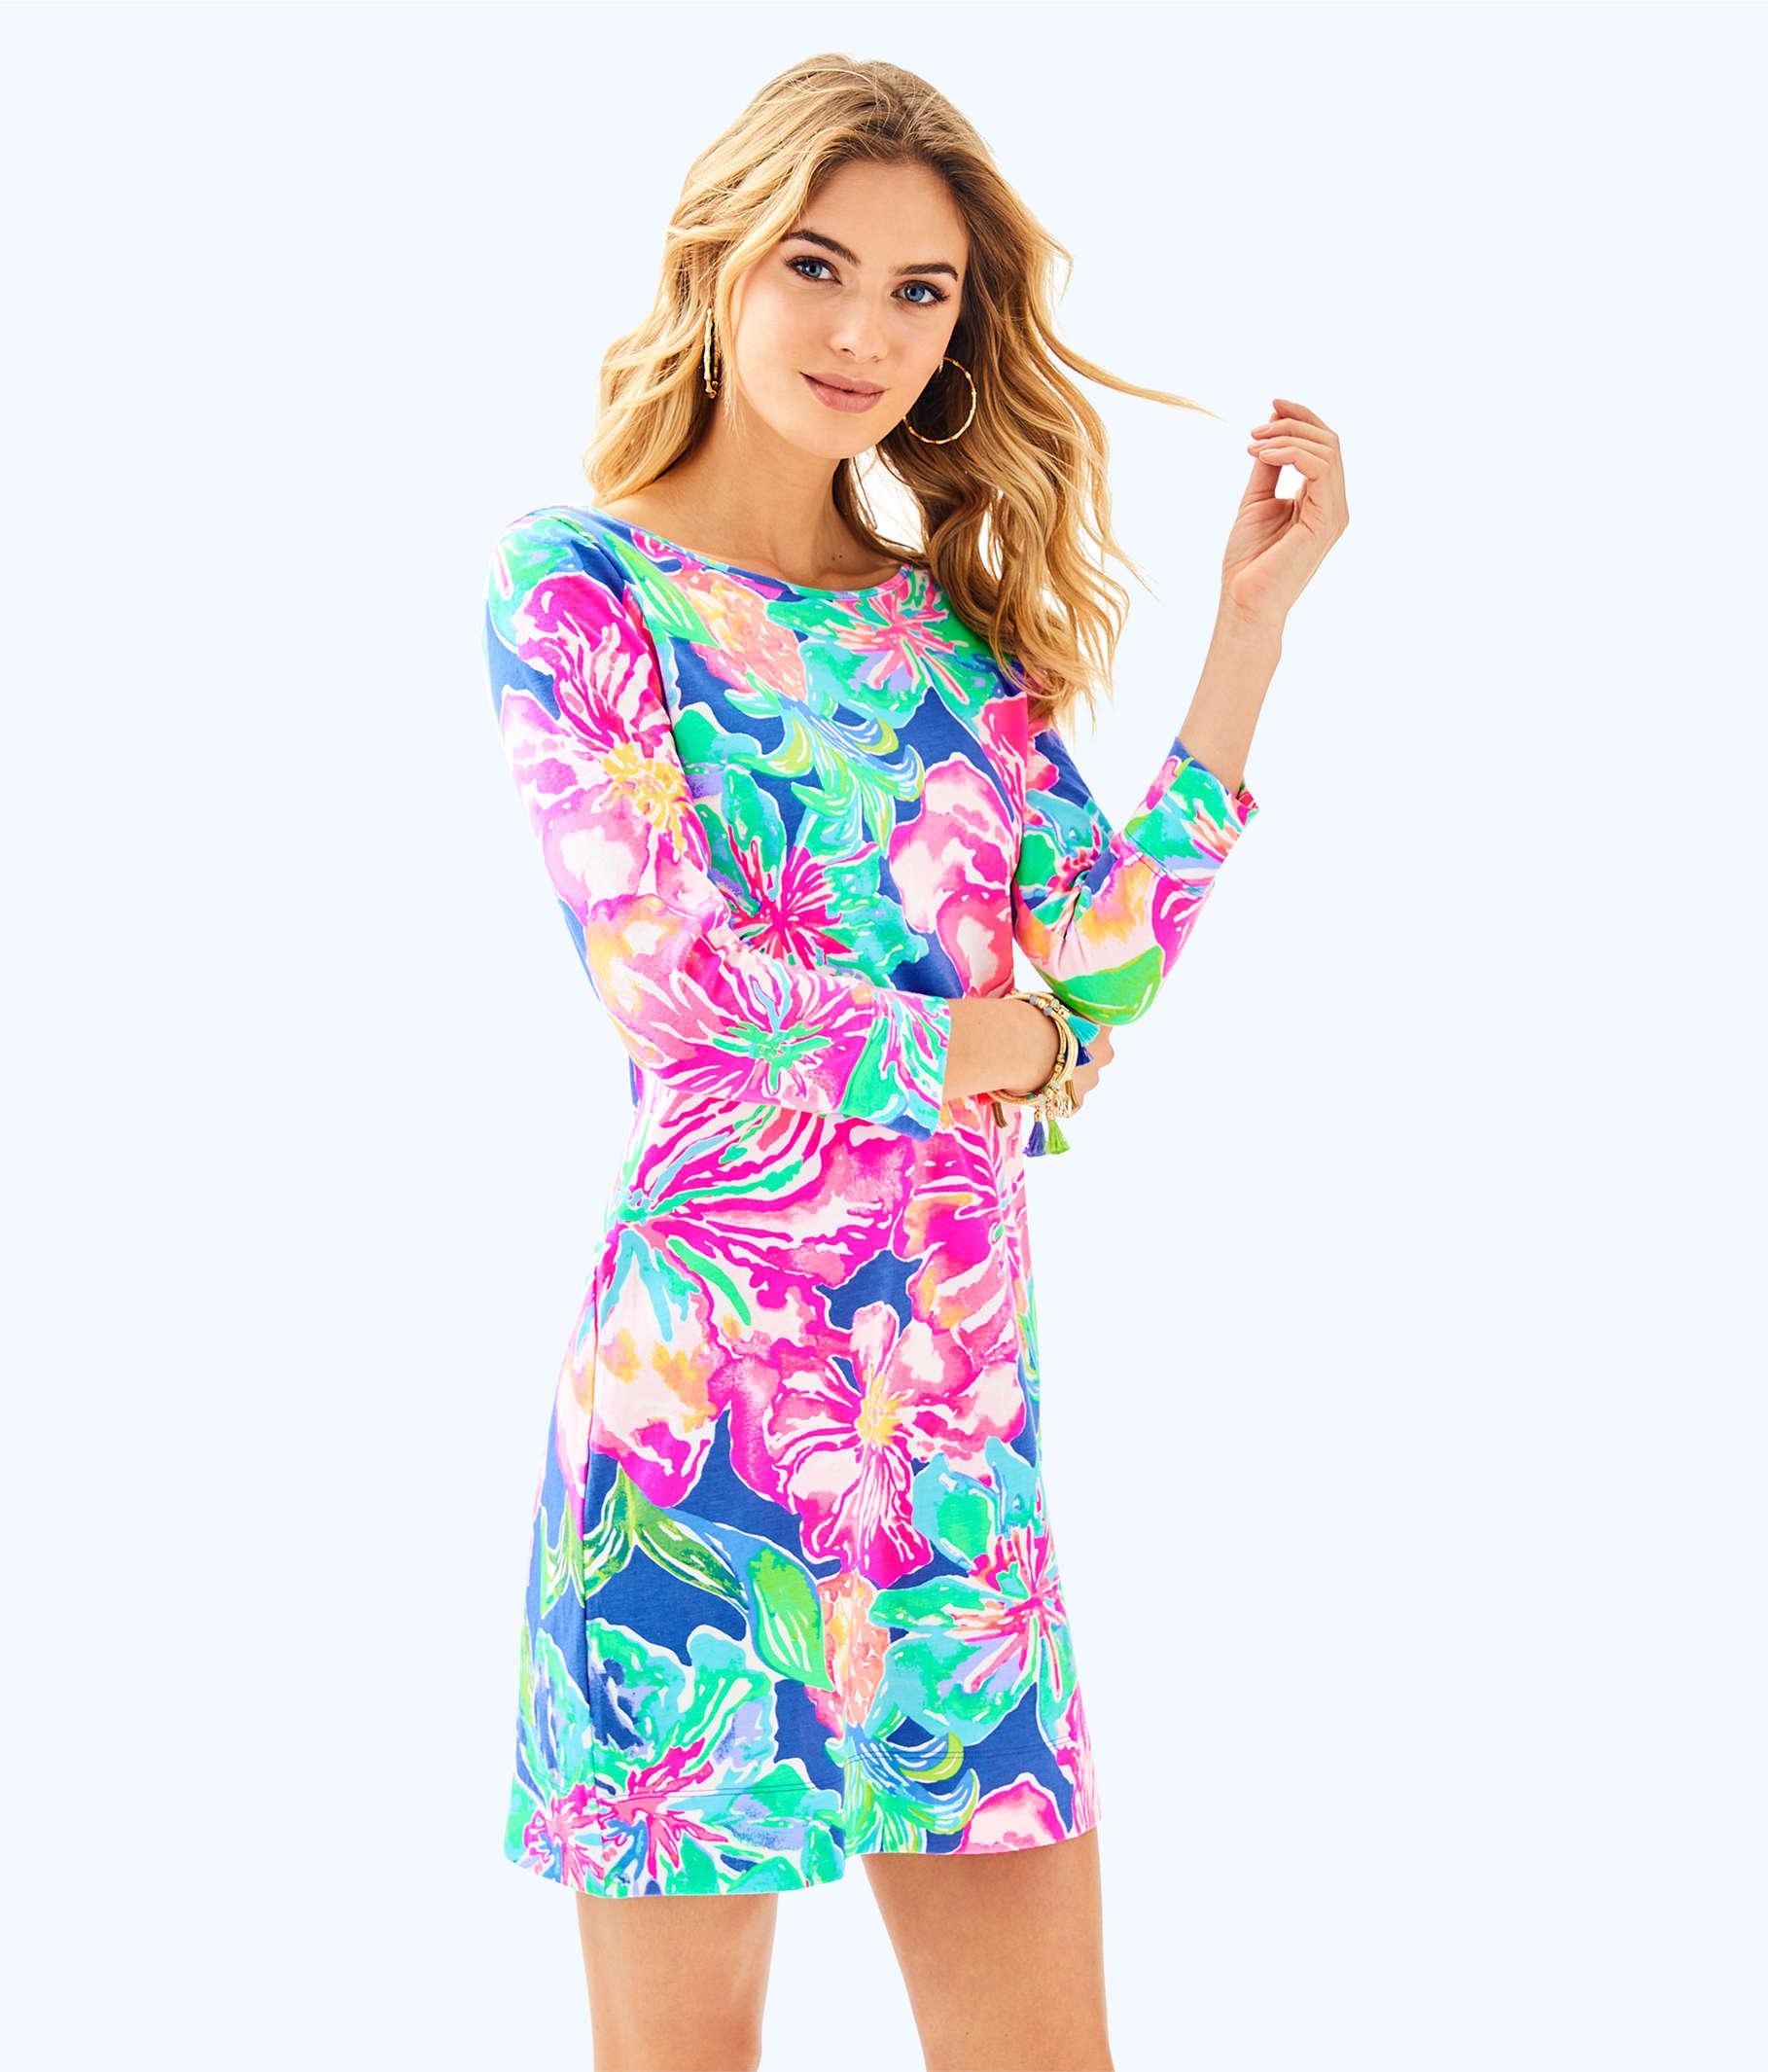 Marlowe Boatneck T Shirt Dress 97181 Lilly Pulitzer